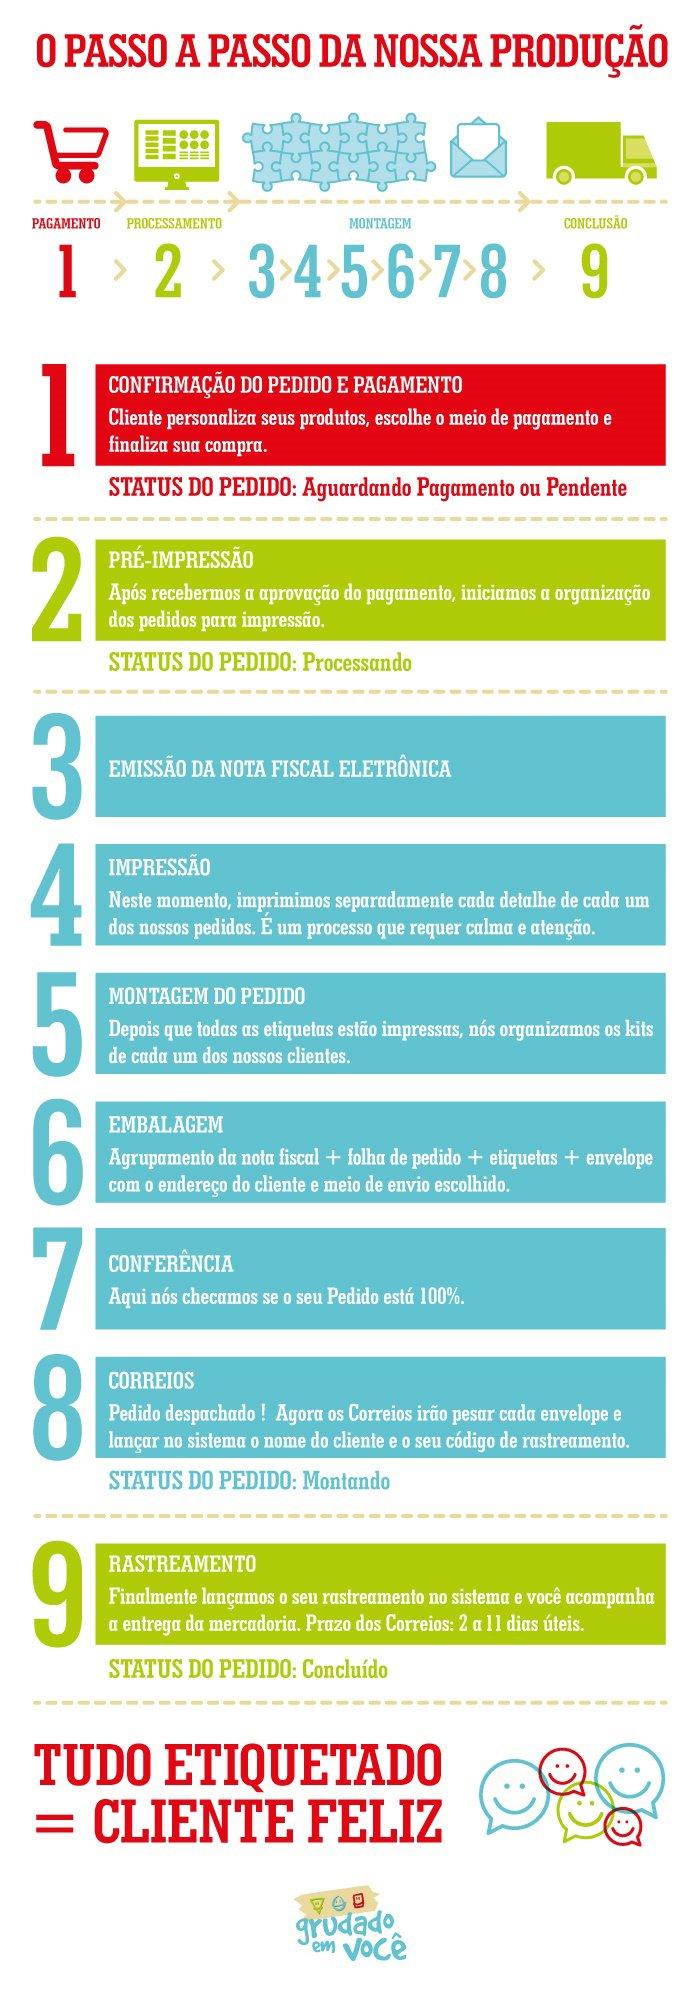 passo_a_passo_producao_05